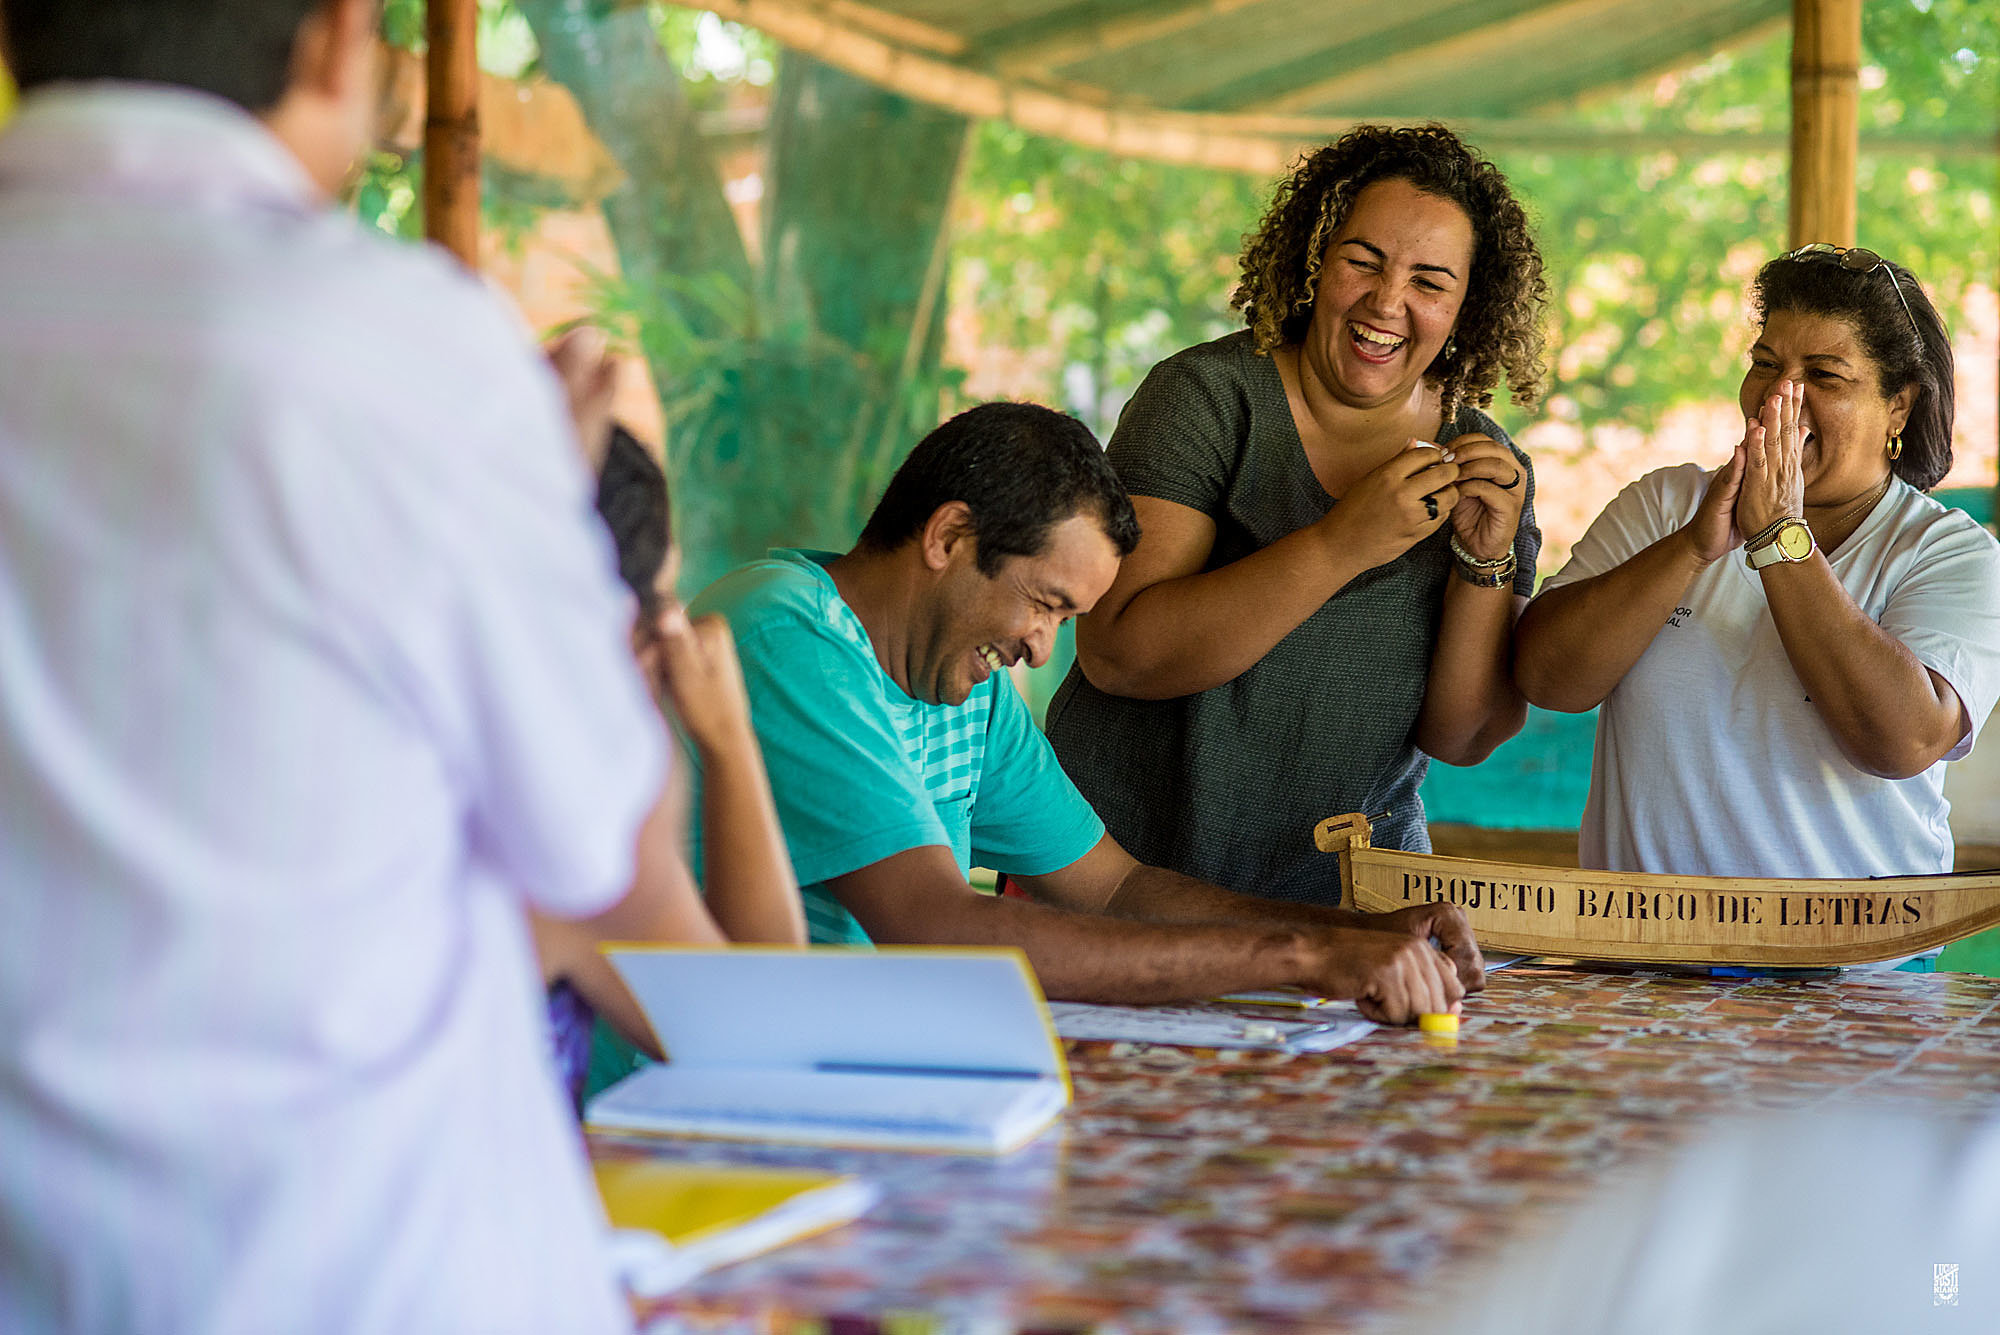 IPEDI Barco de Letras BrazilFoundation Alfabetizacao Mato Grosso do Sul Literacy Educacao Education